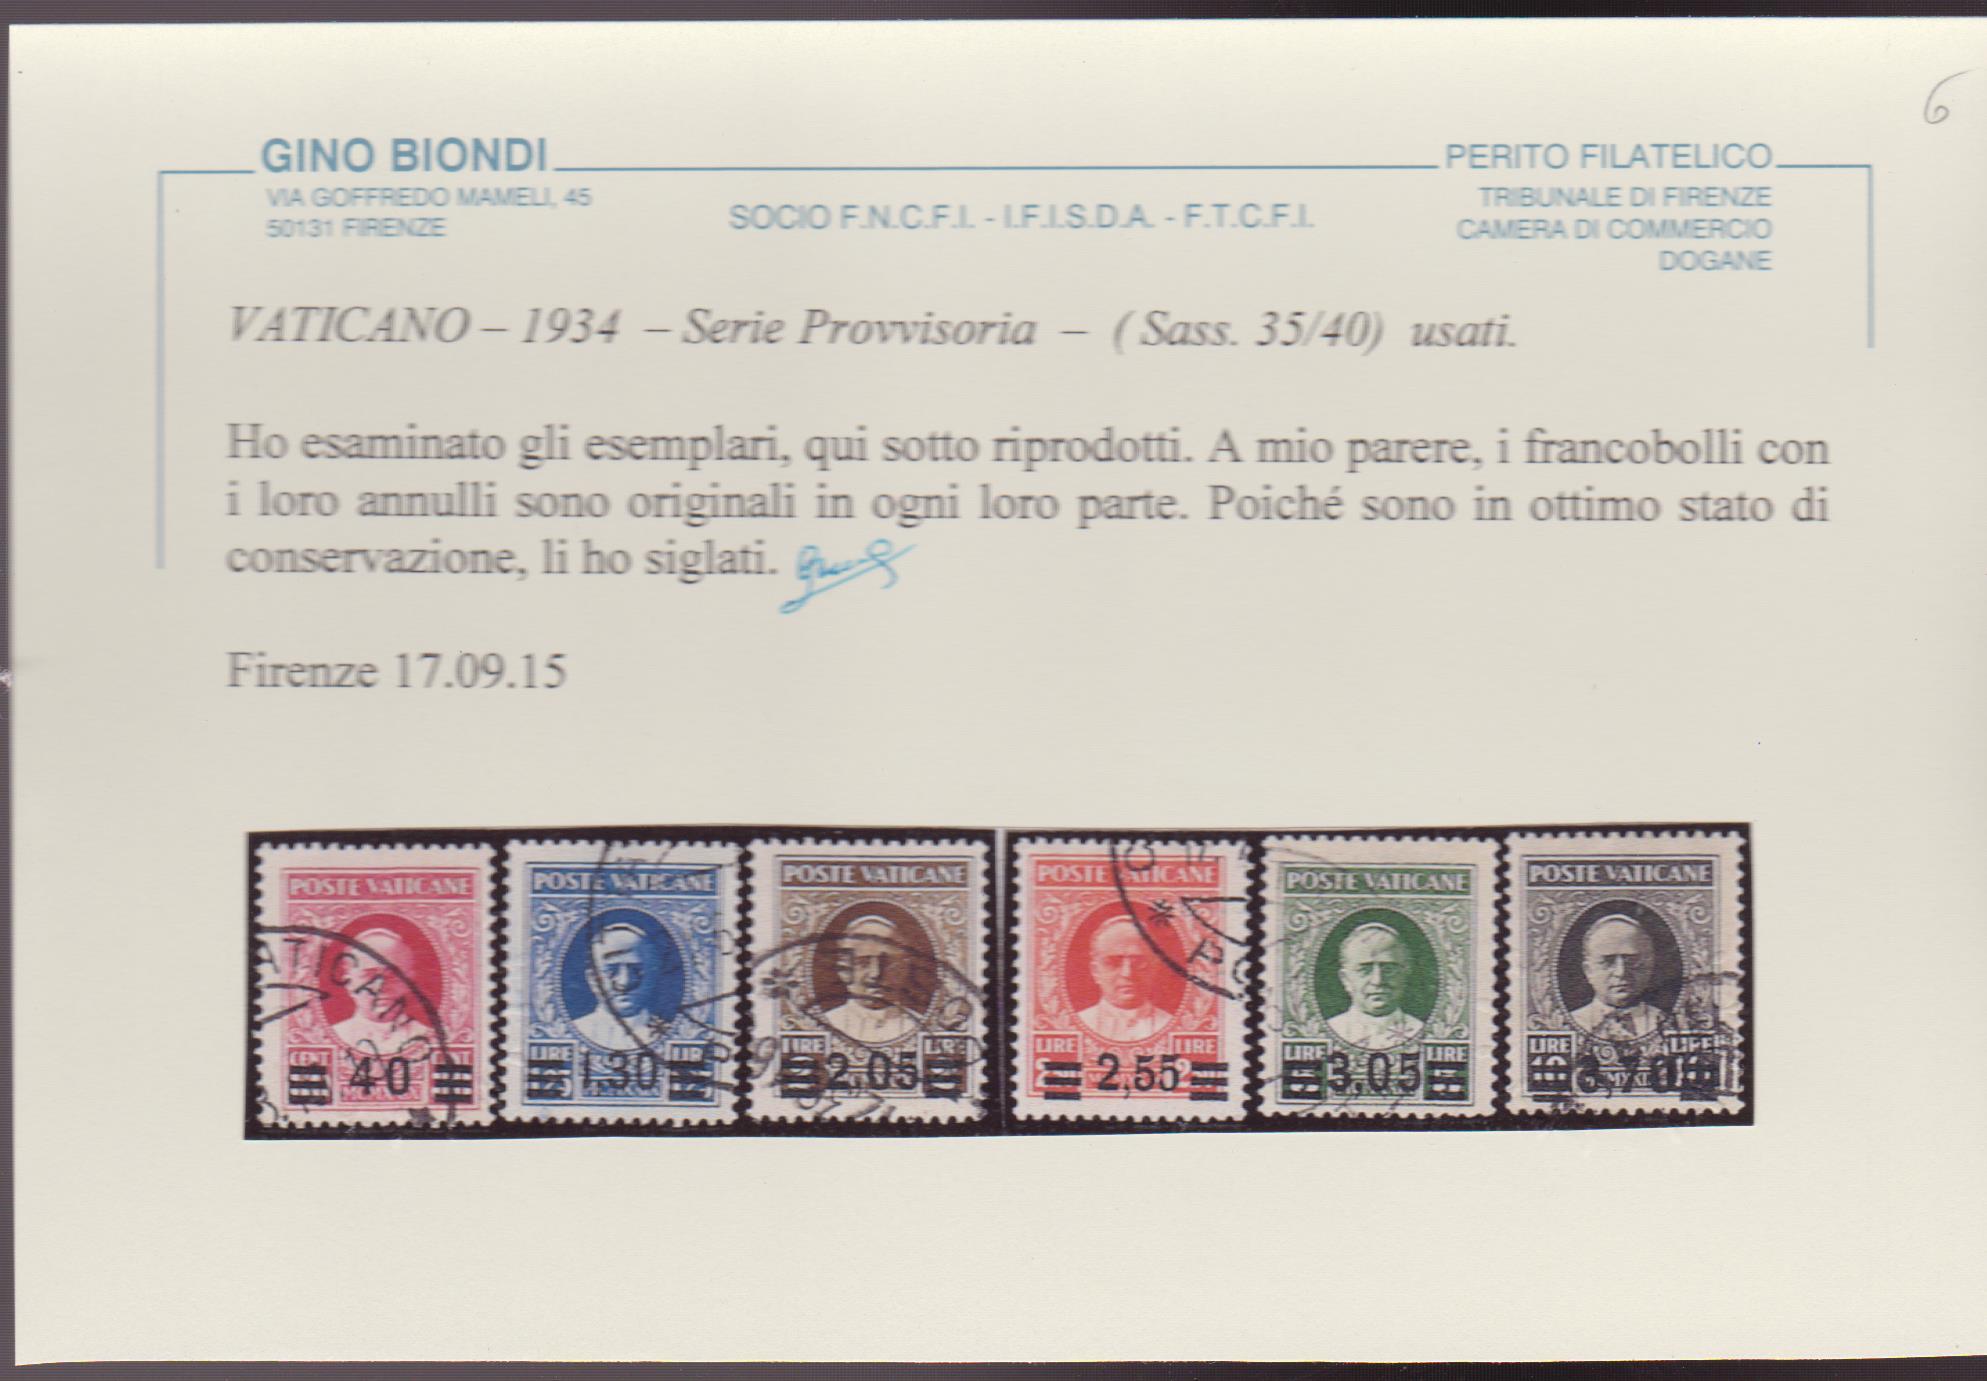 cert-vaticano-us-biondi-001